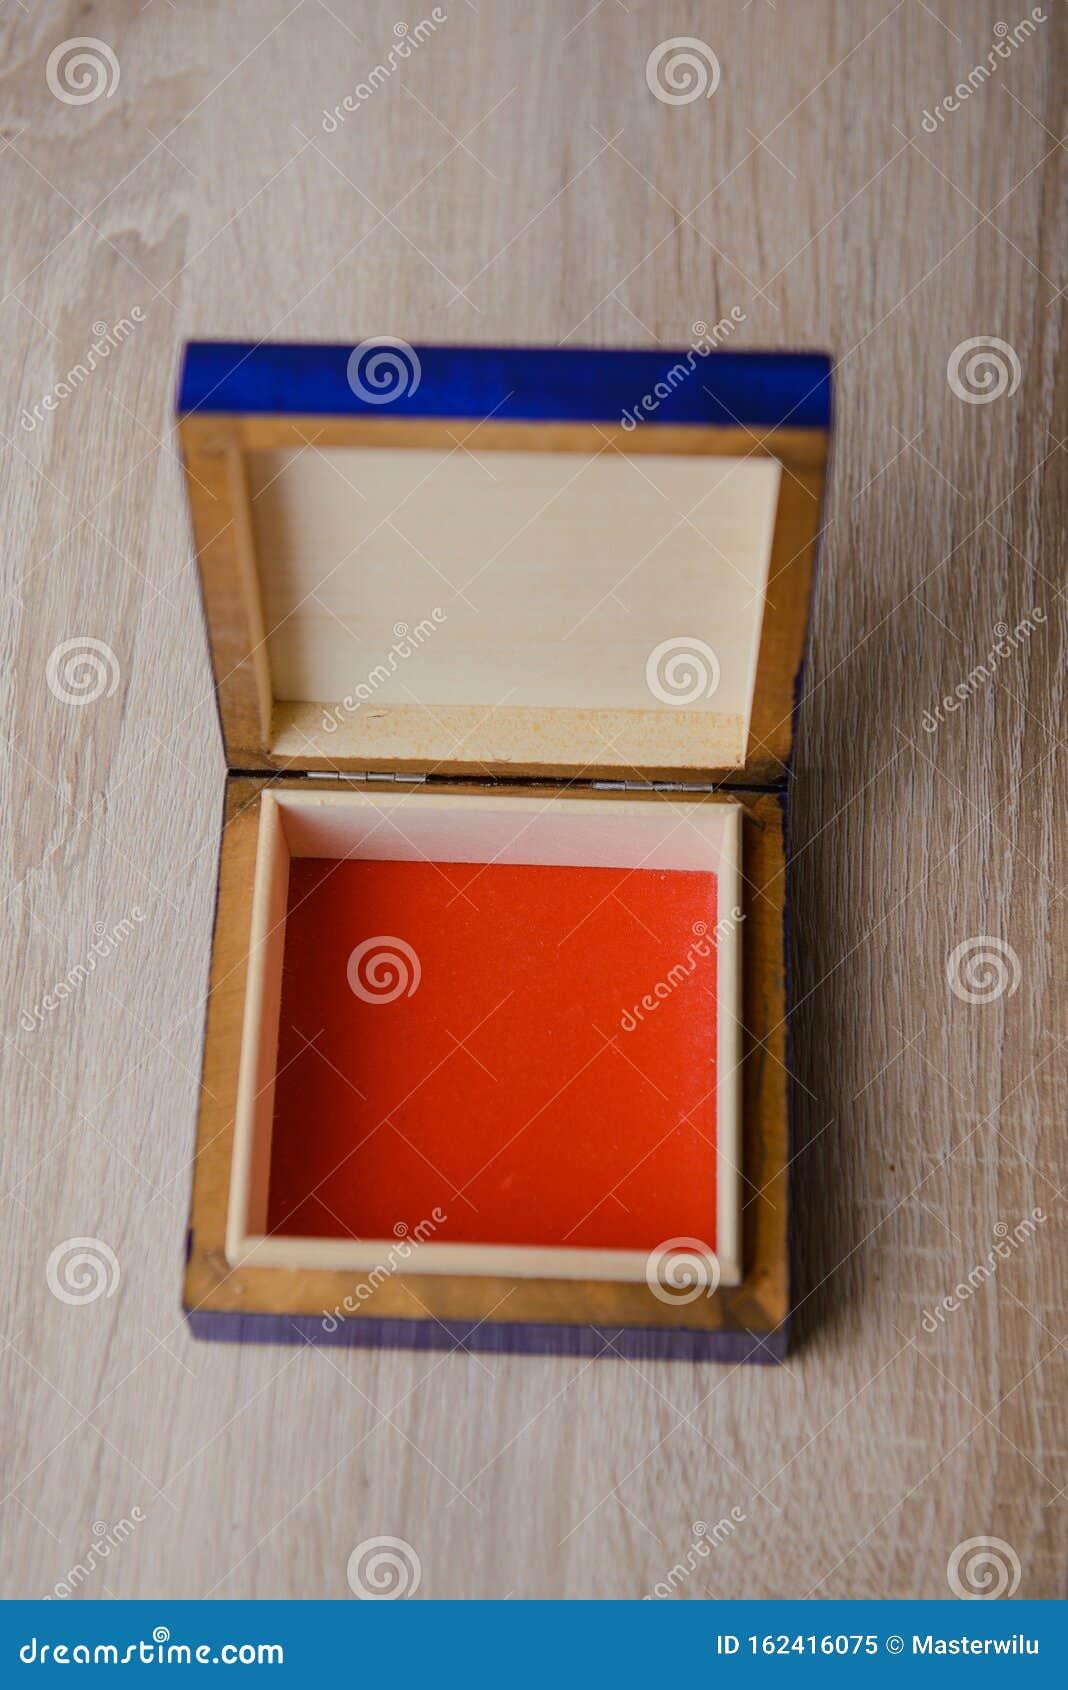 Vintage Blue /& Gold Jewellery Box